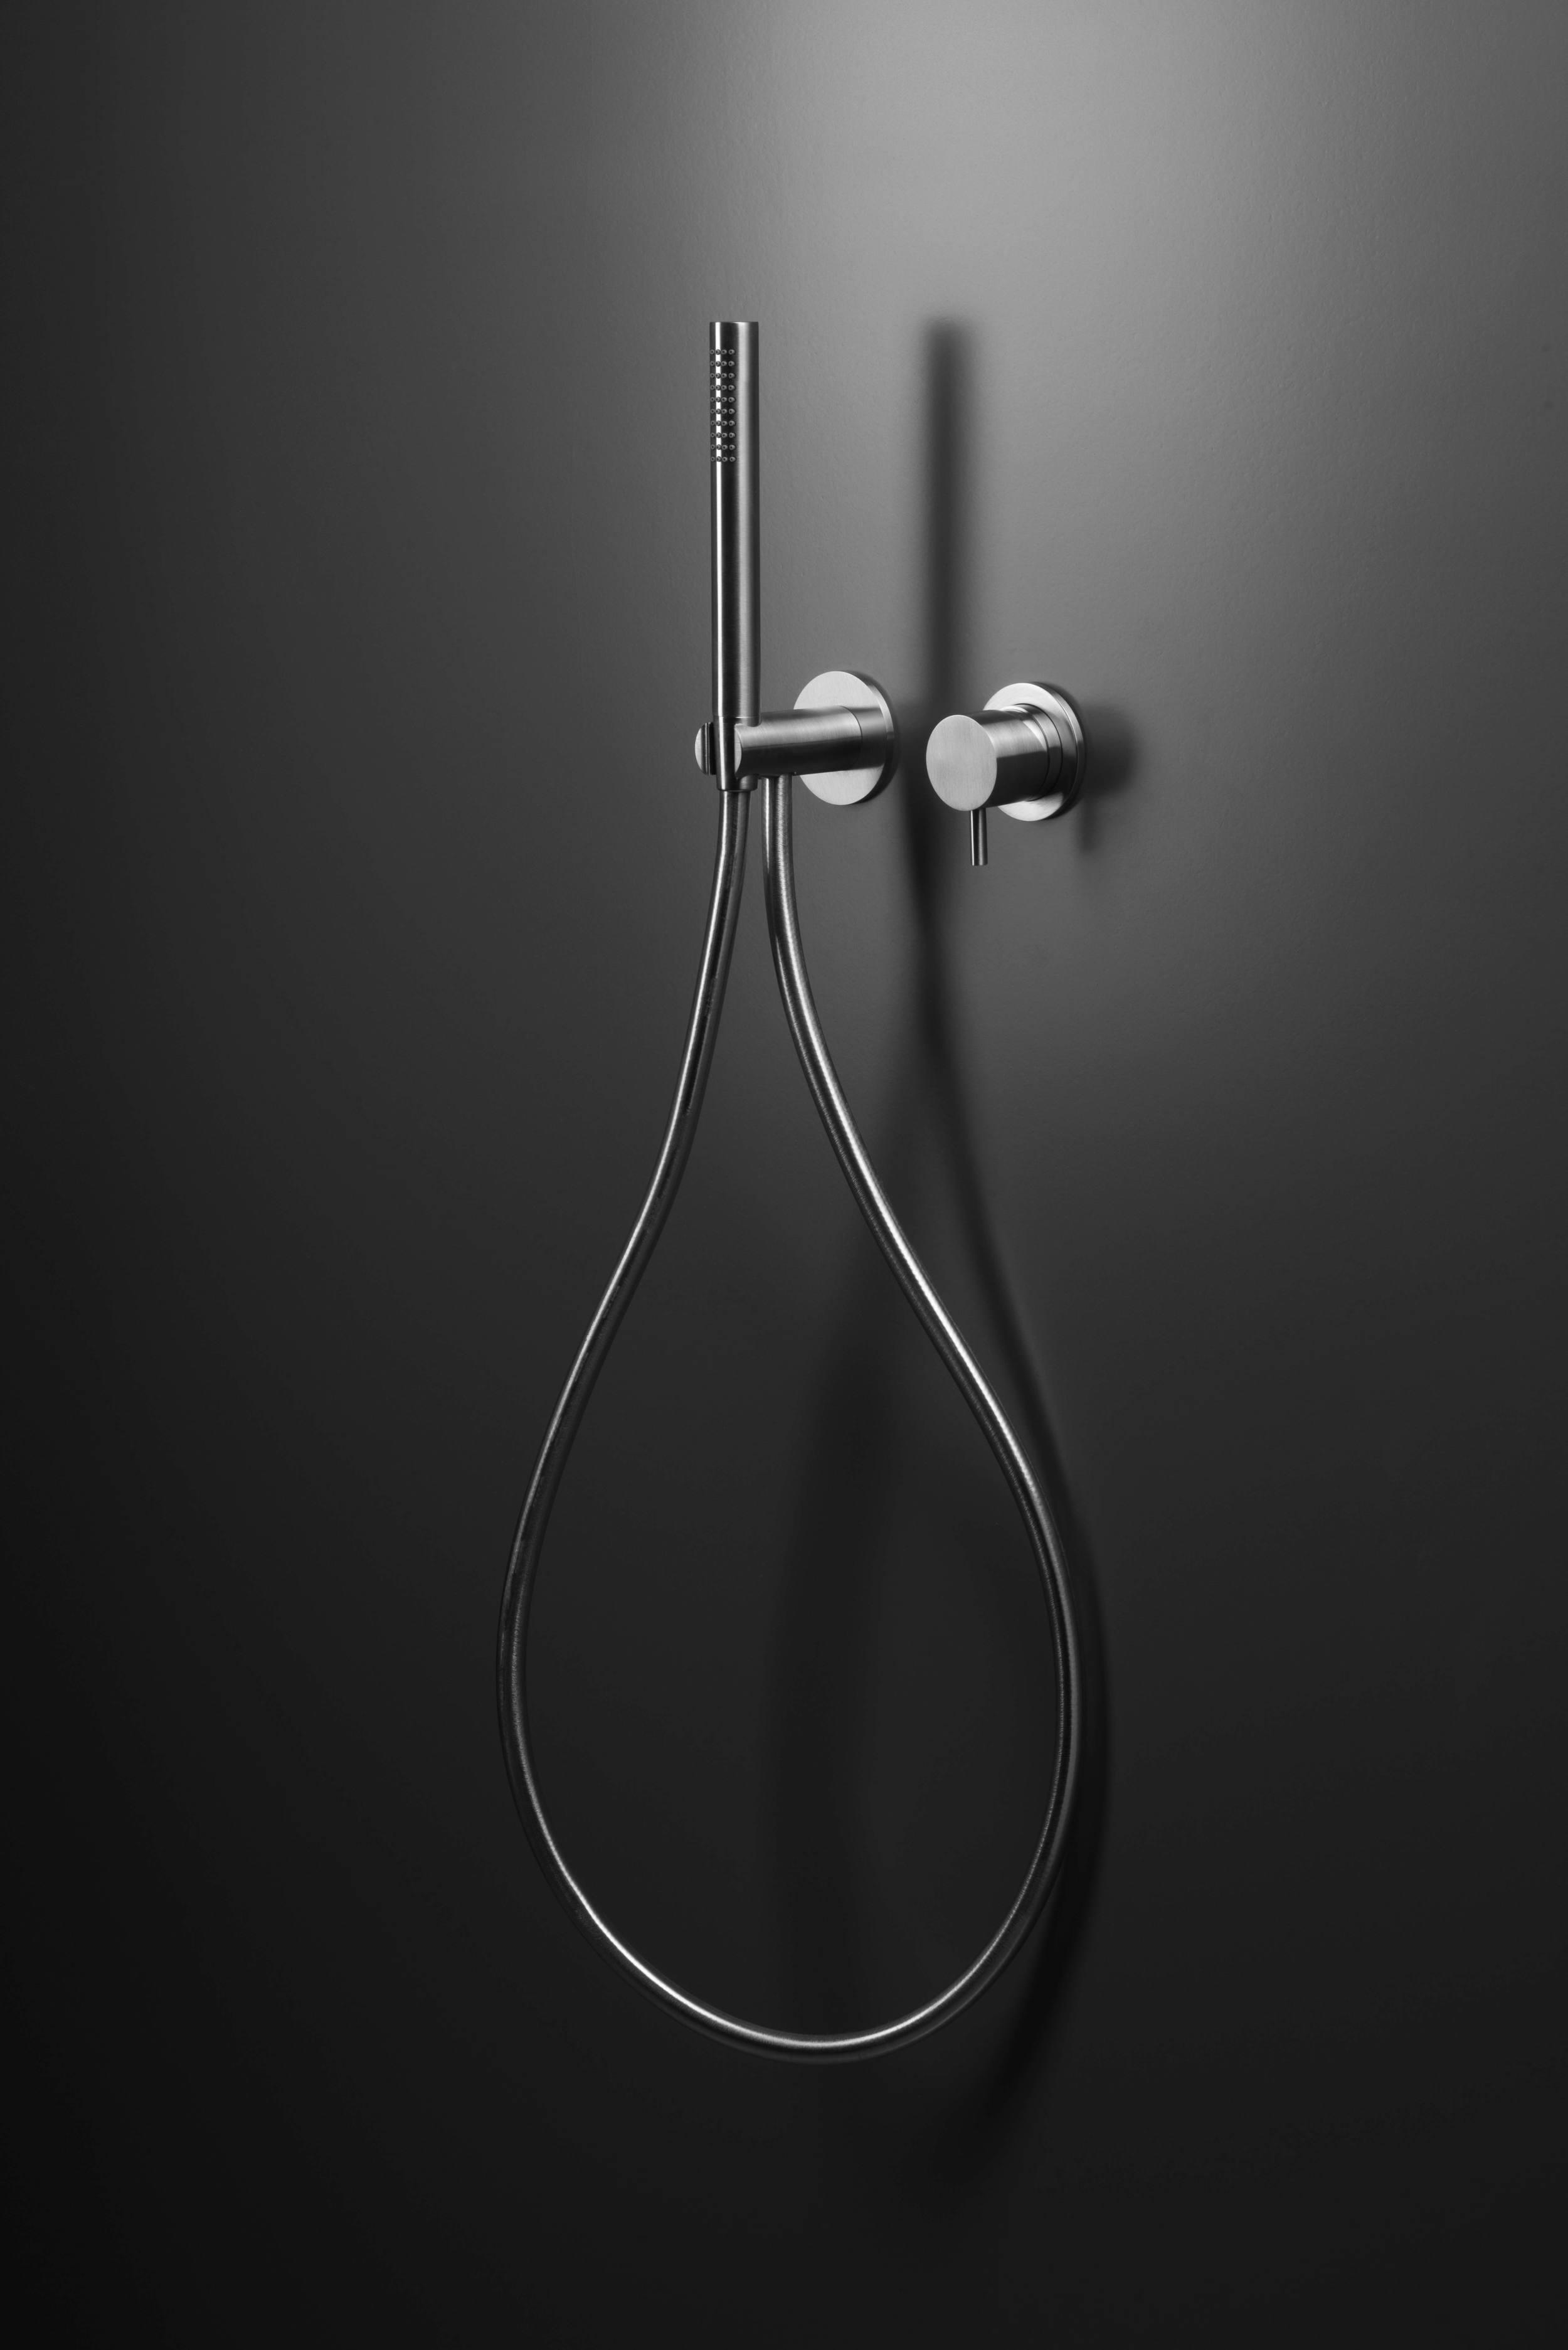 INOX Shower Station, Courtesy Blu Bathworks